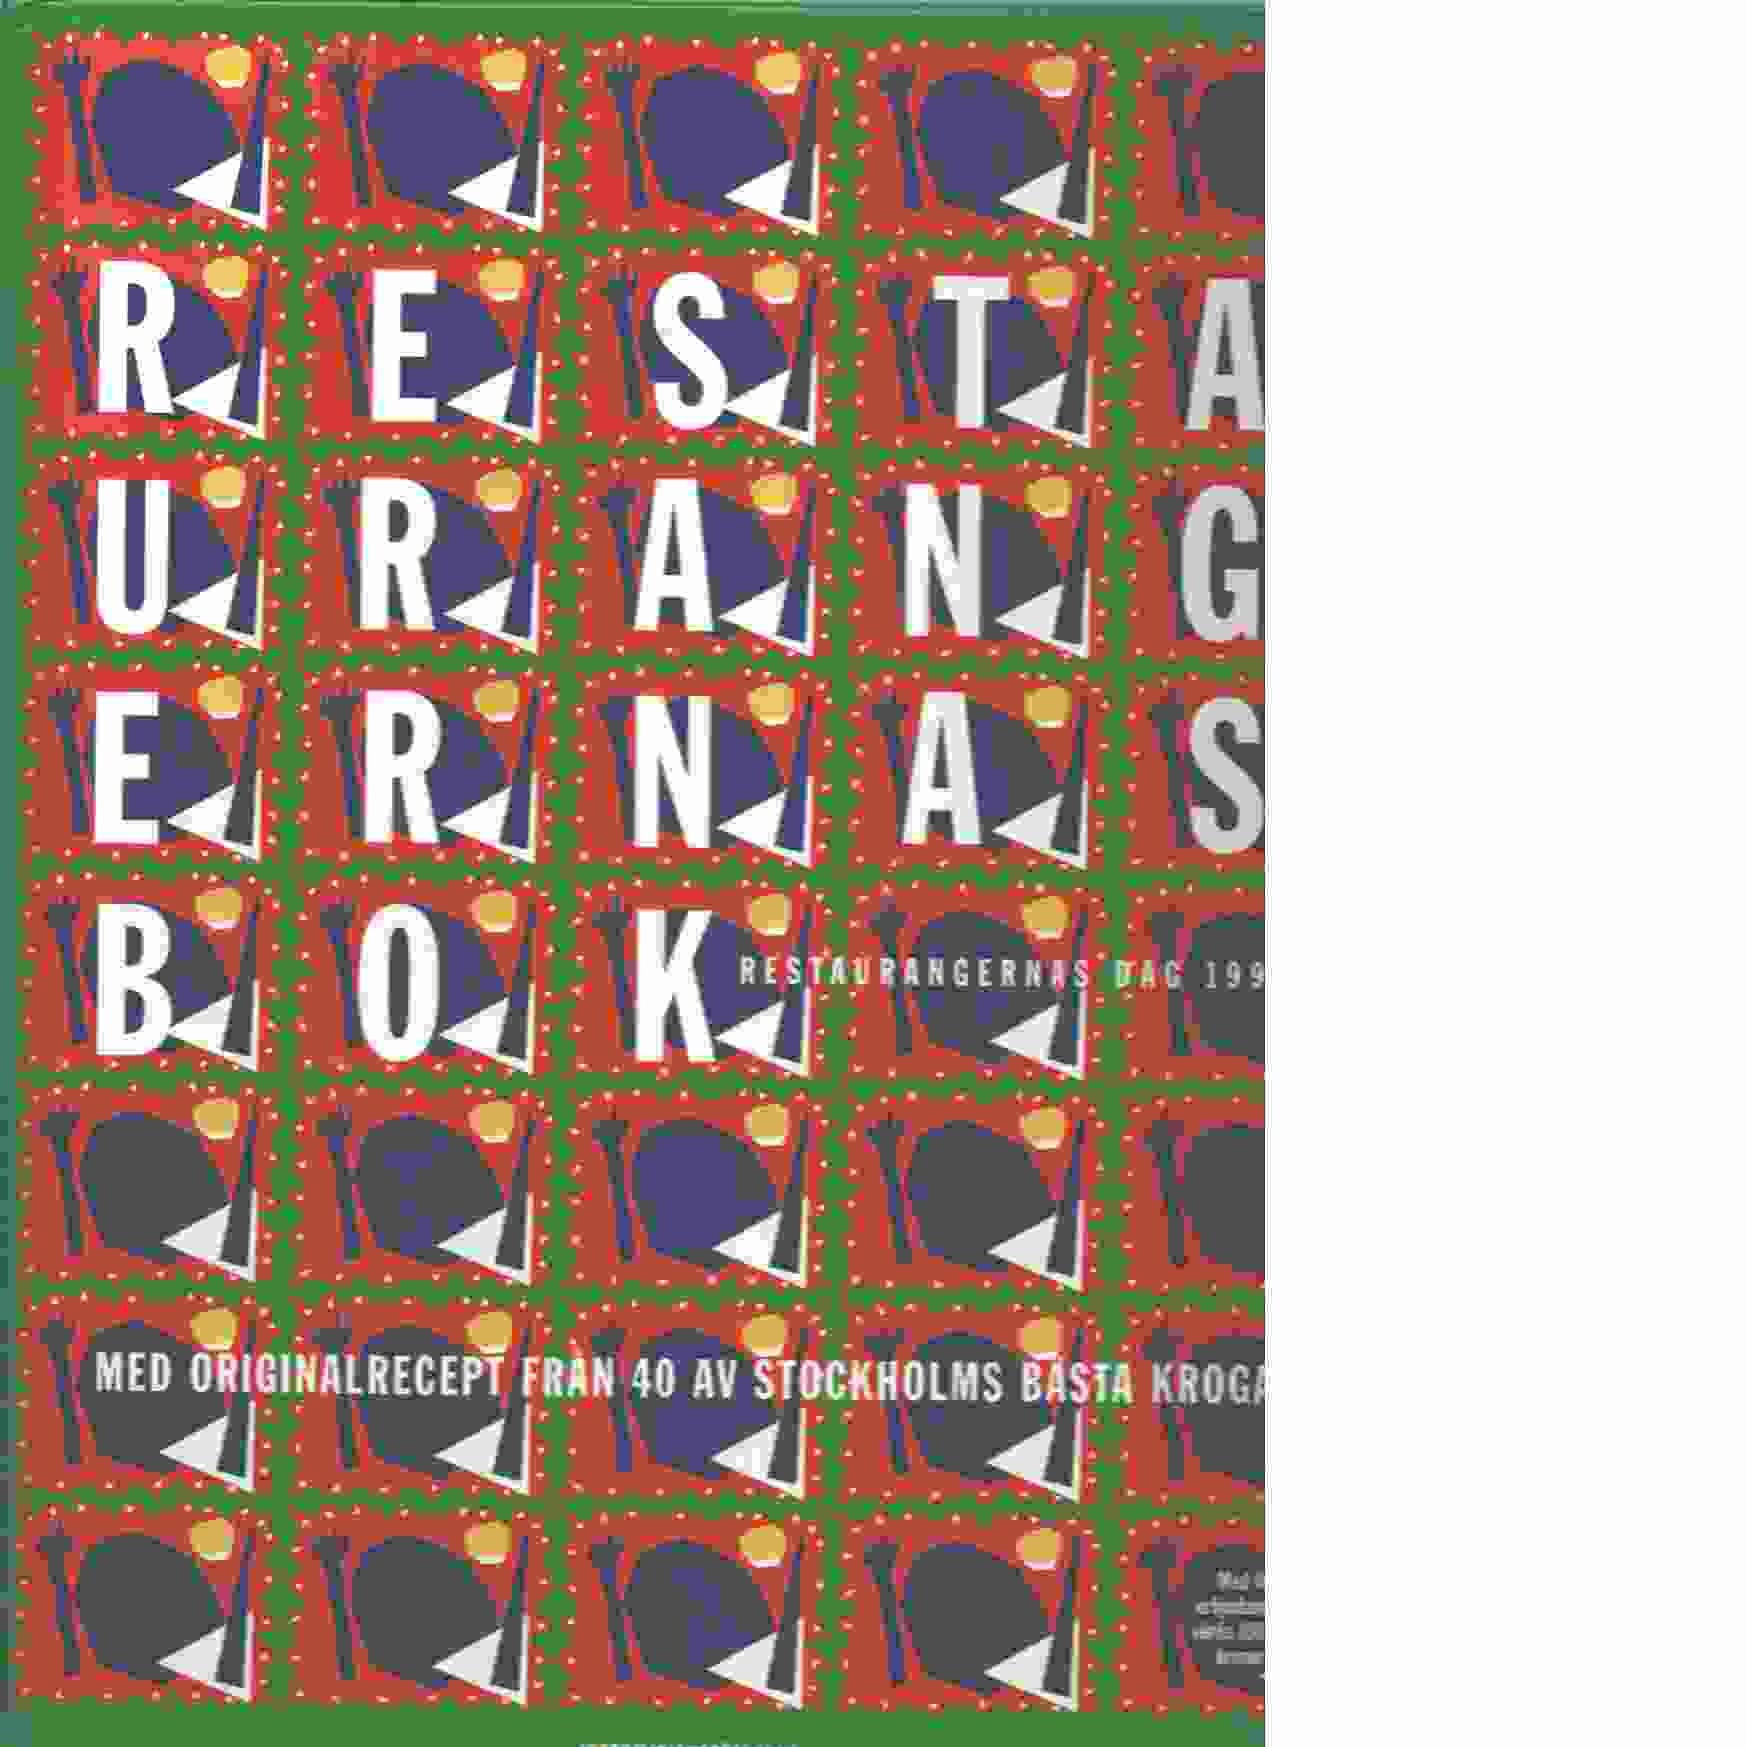 Restaurangernas bok - Erikson, Cristina och Triberg, Annica